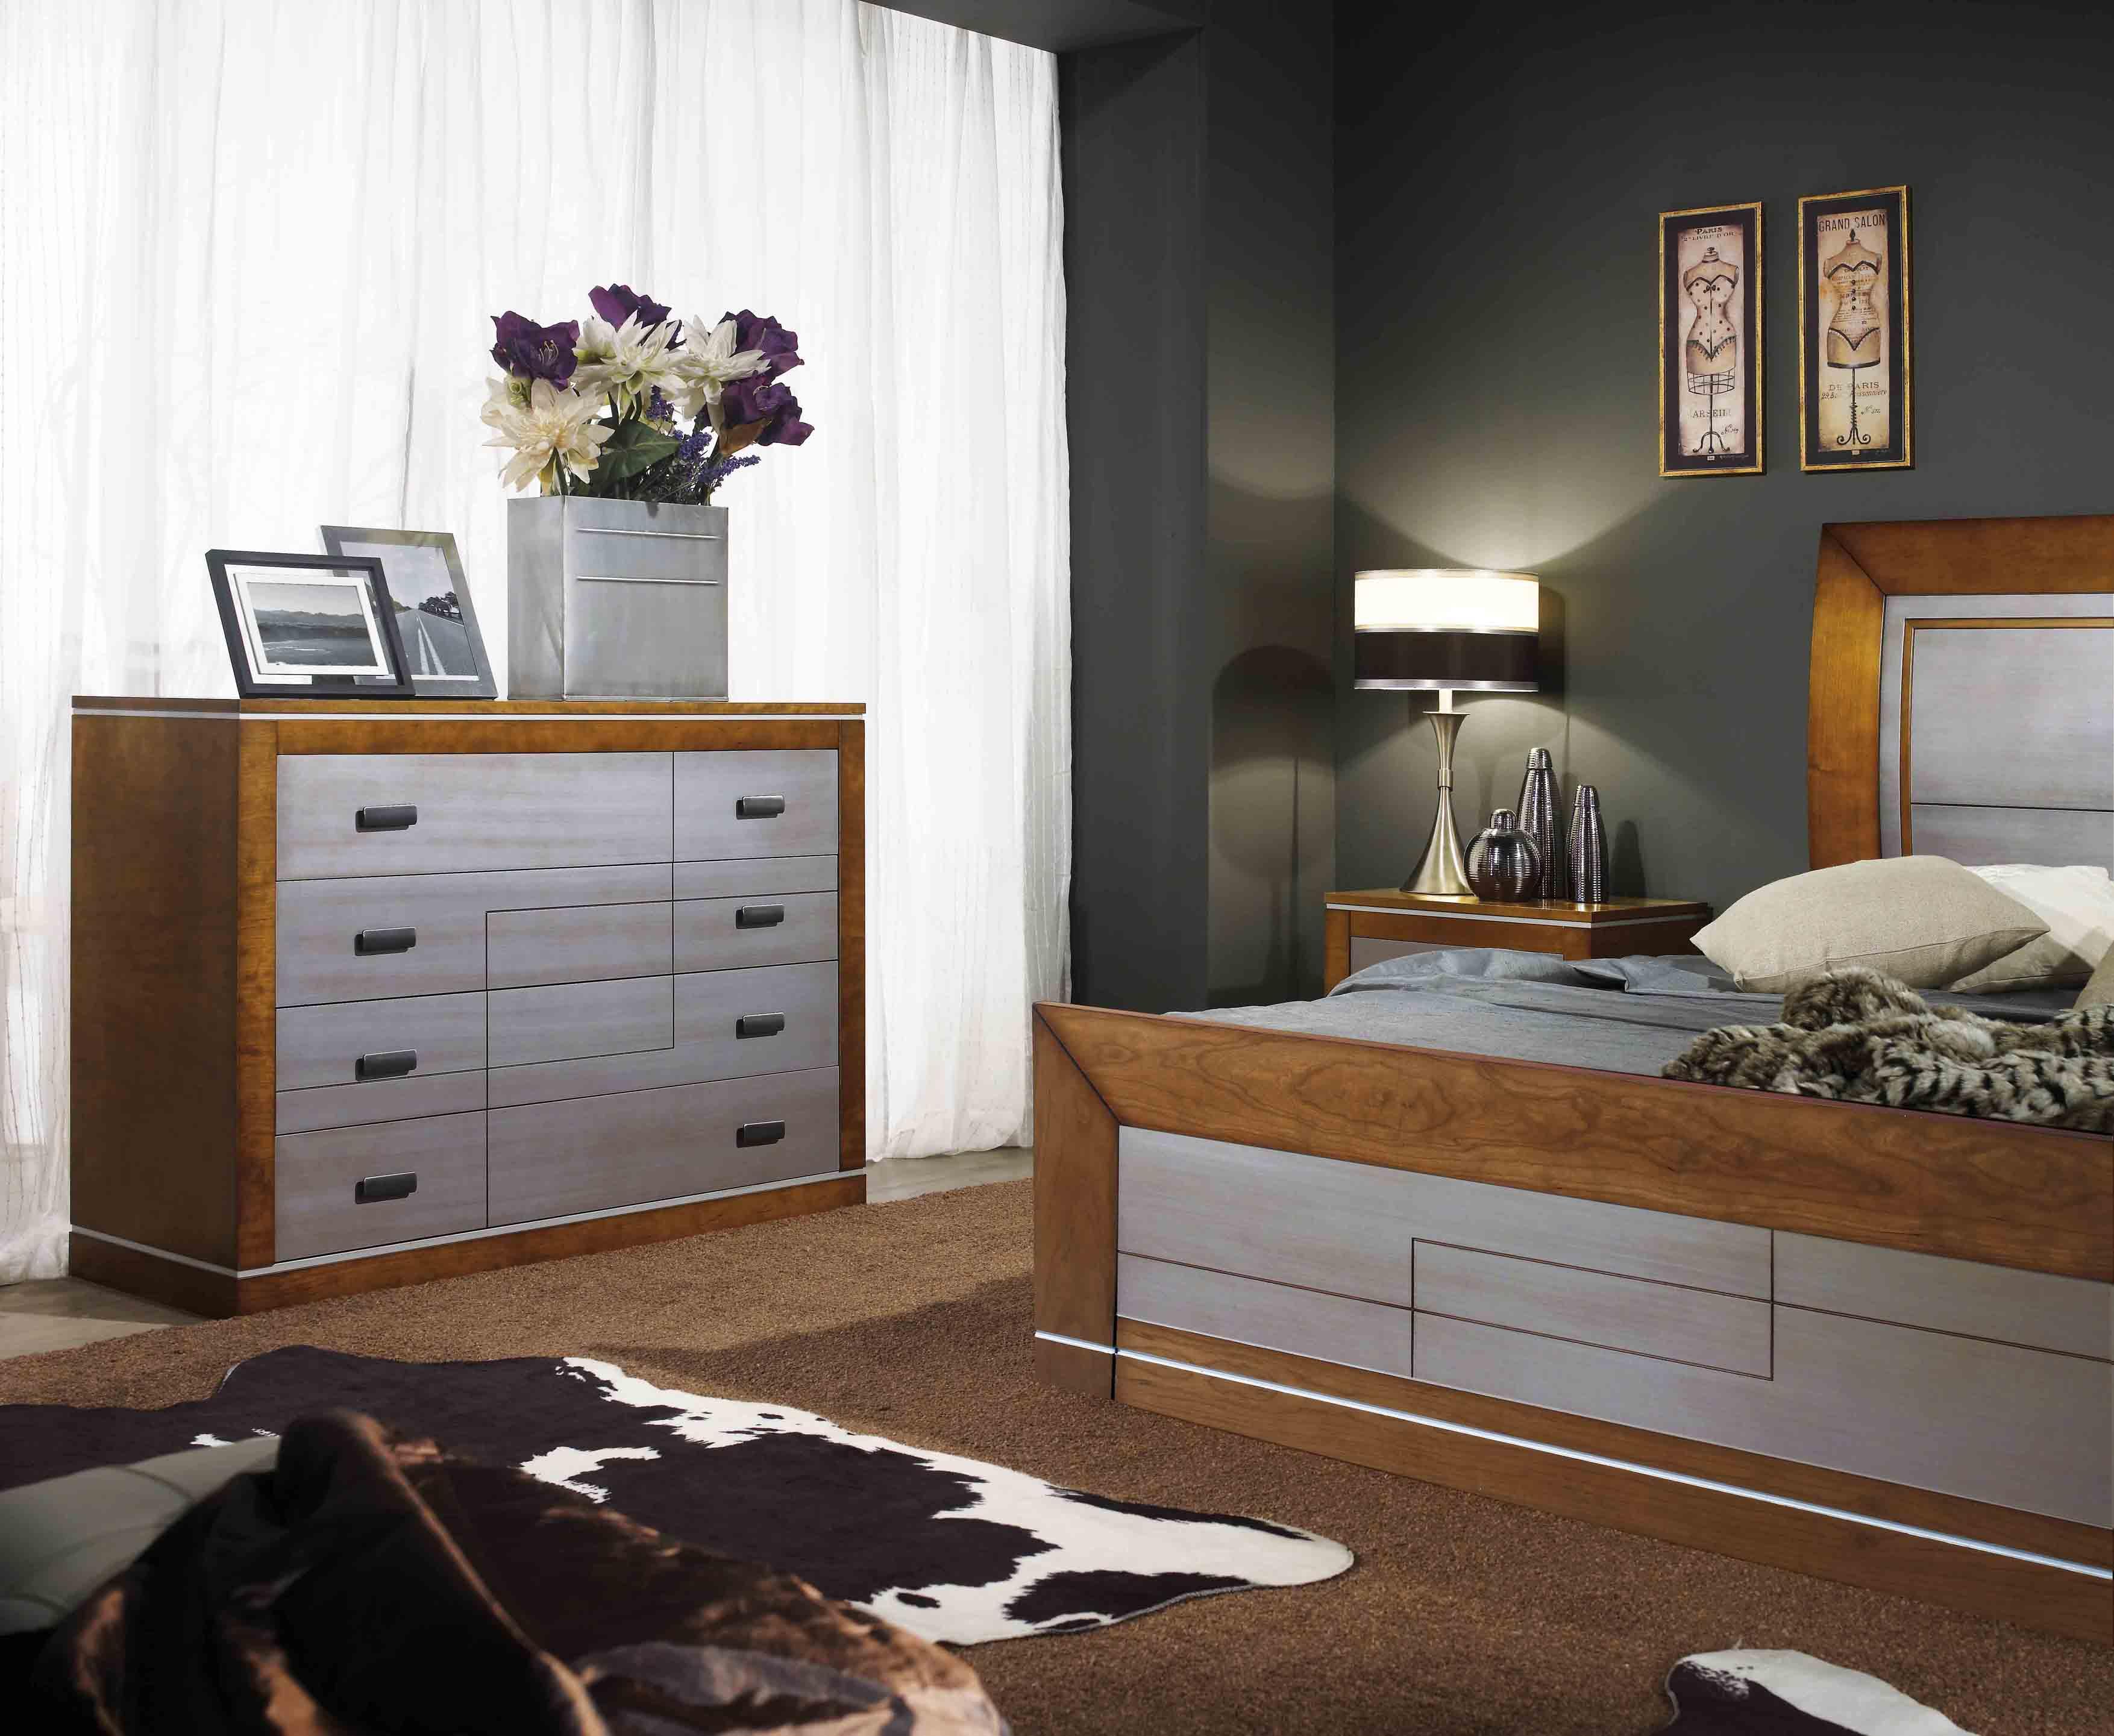 Matrimonio Rustico Moderno : Dormitorio matrimonio moderno merino zaidin